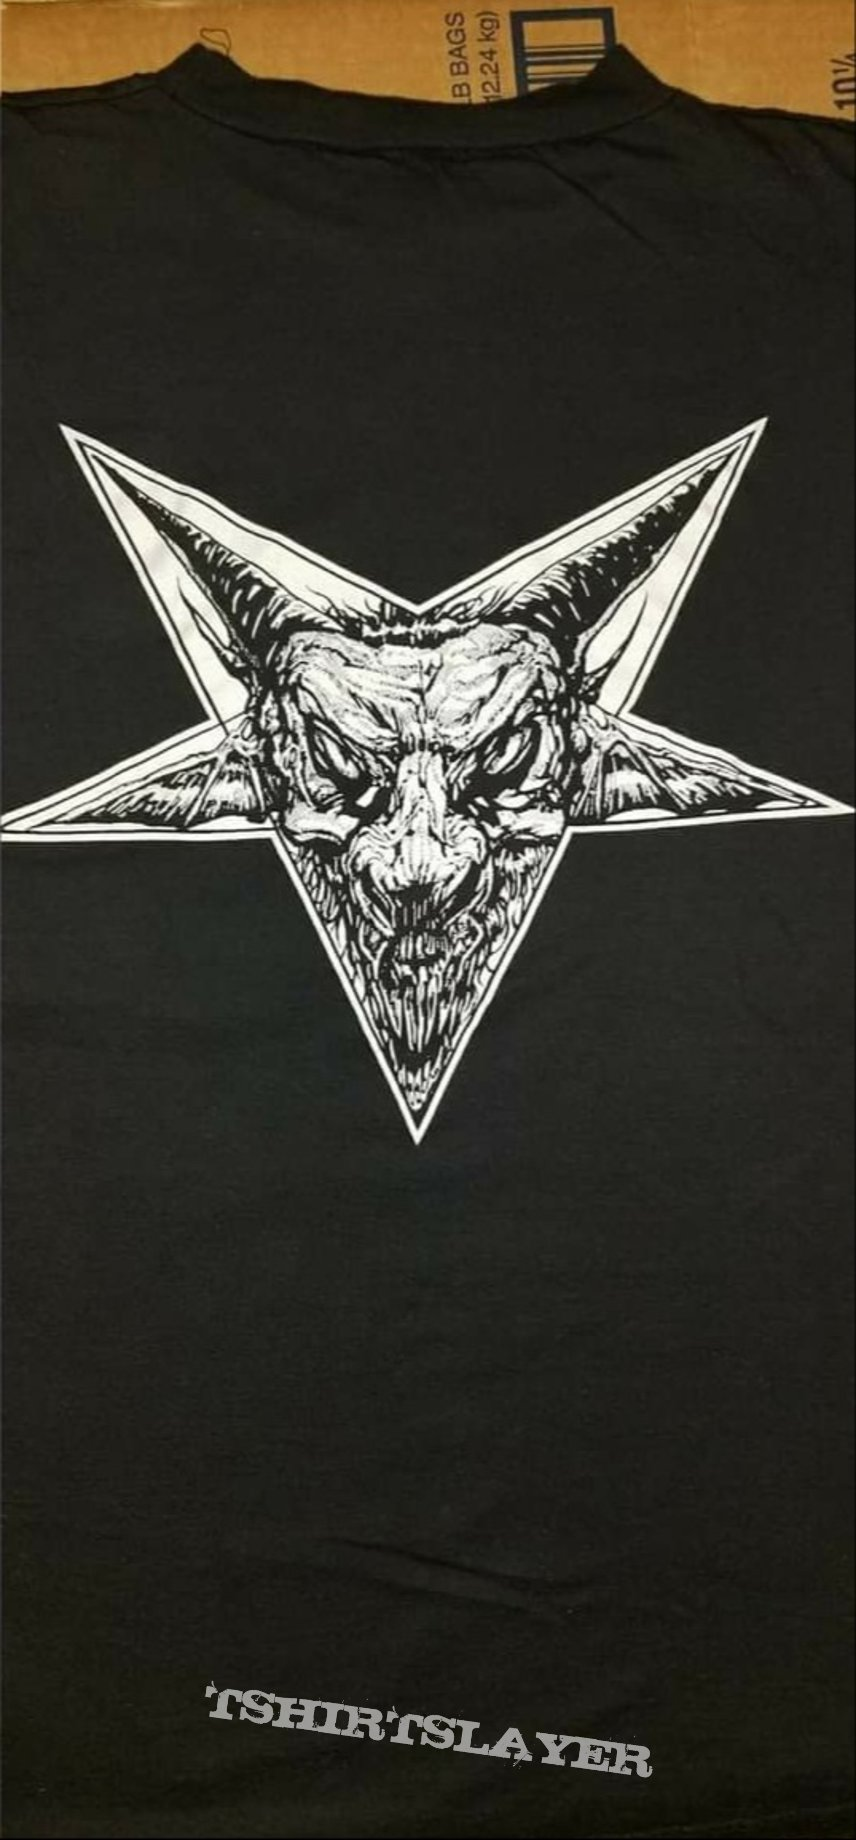 Asphyx shirt